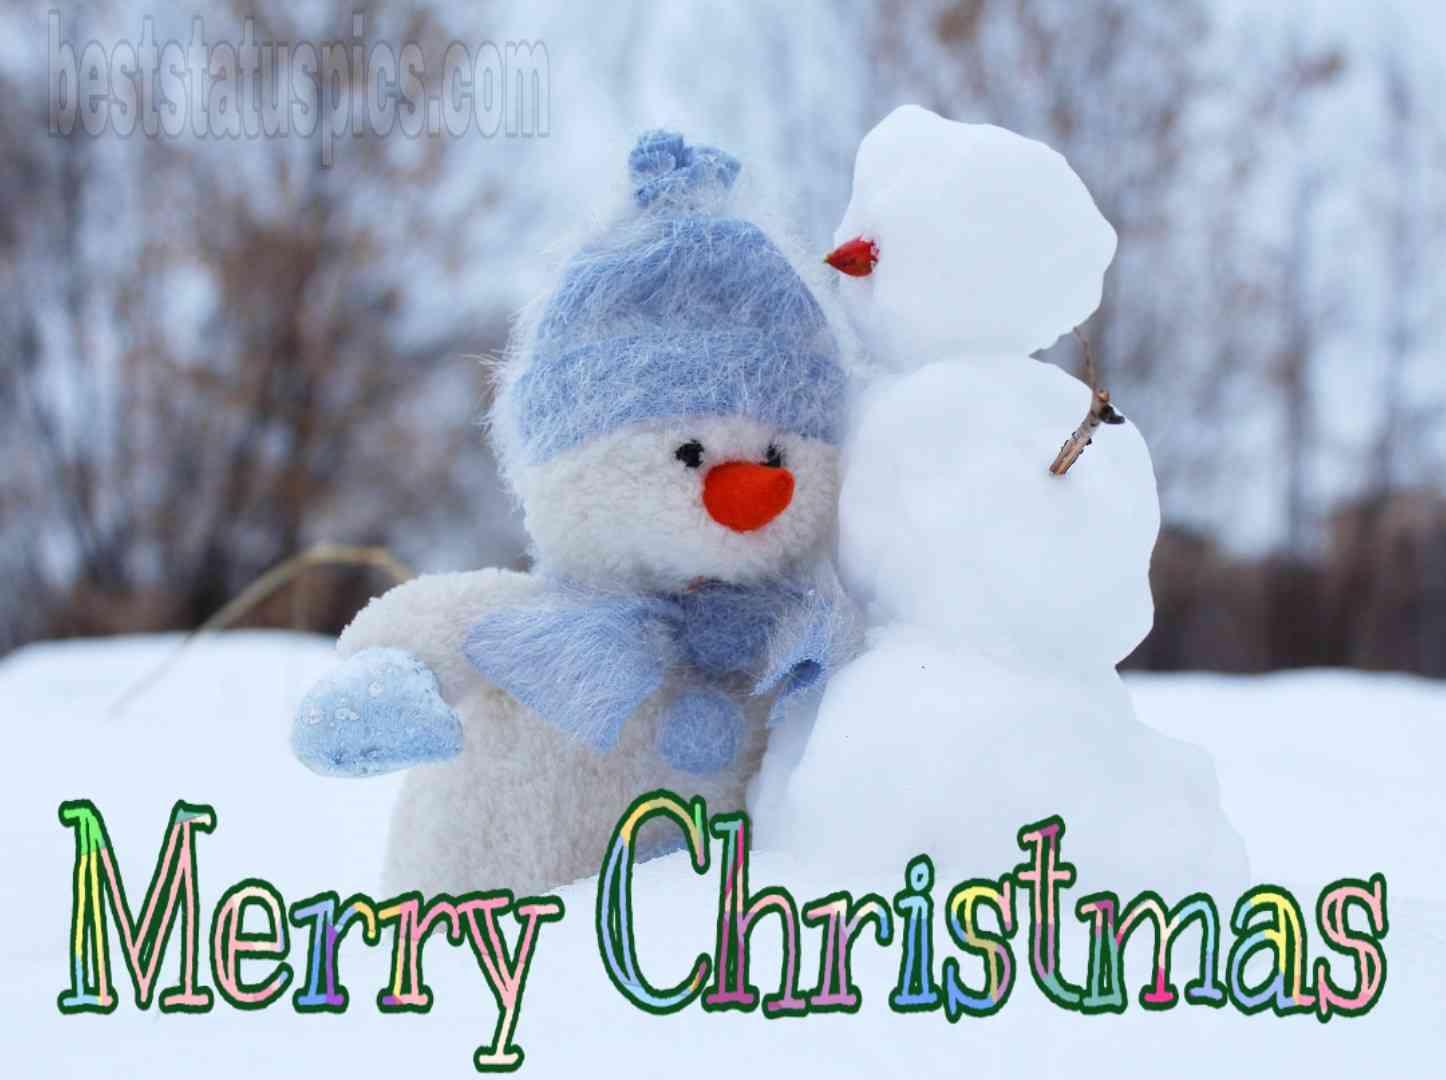 Merry Christmas wishes 2019 Whatsapp Status Picture